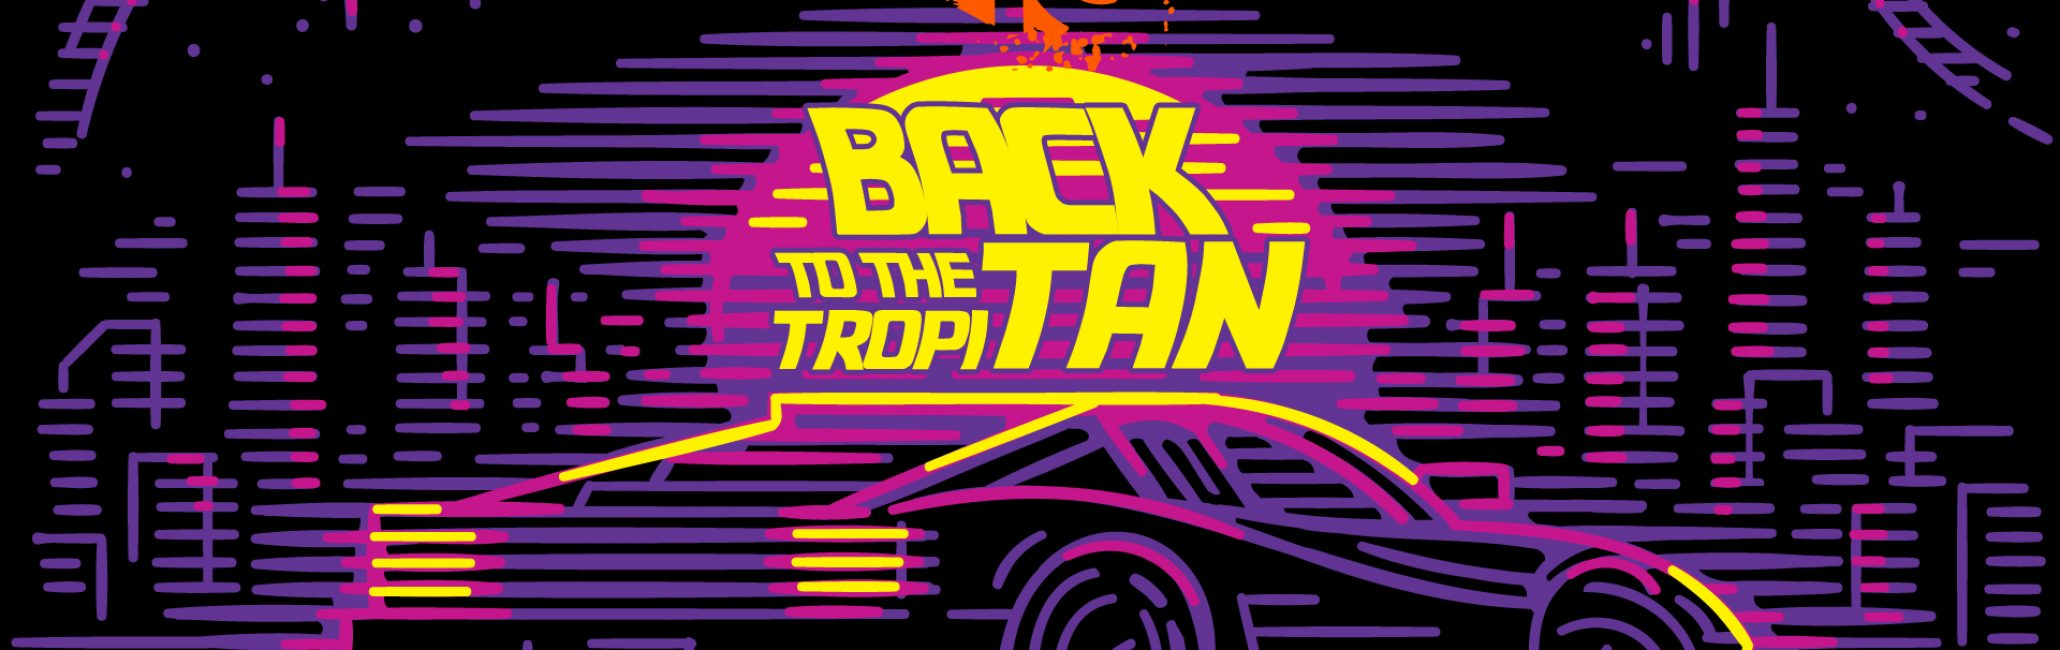 tropi-tan-40th-facebook-header-4